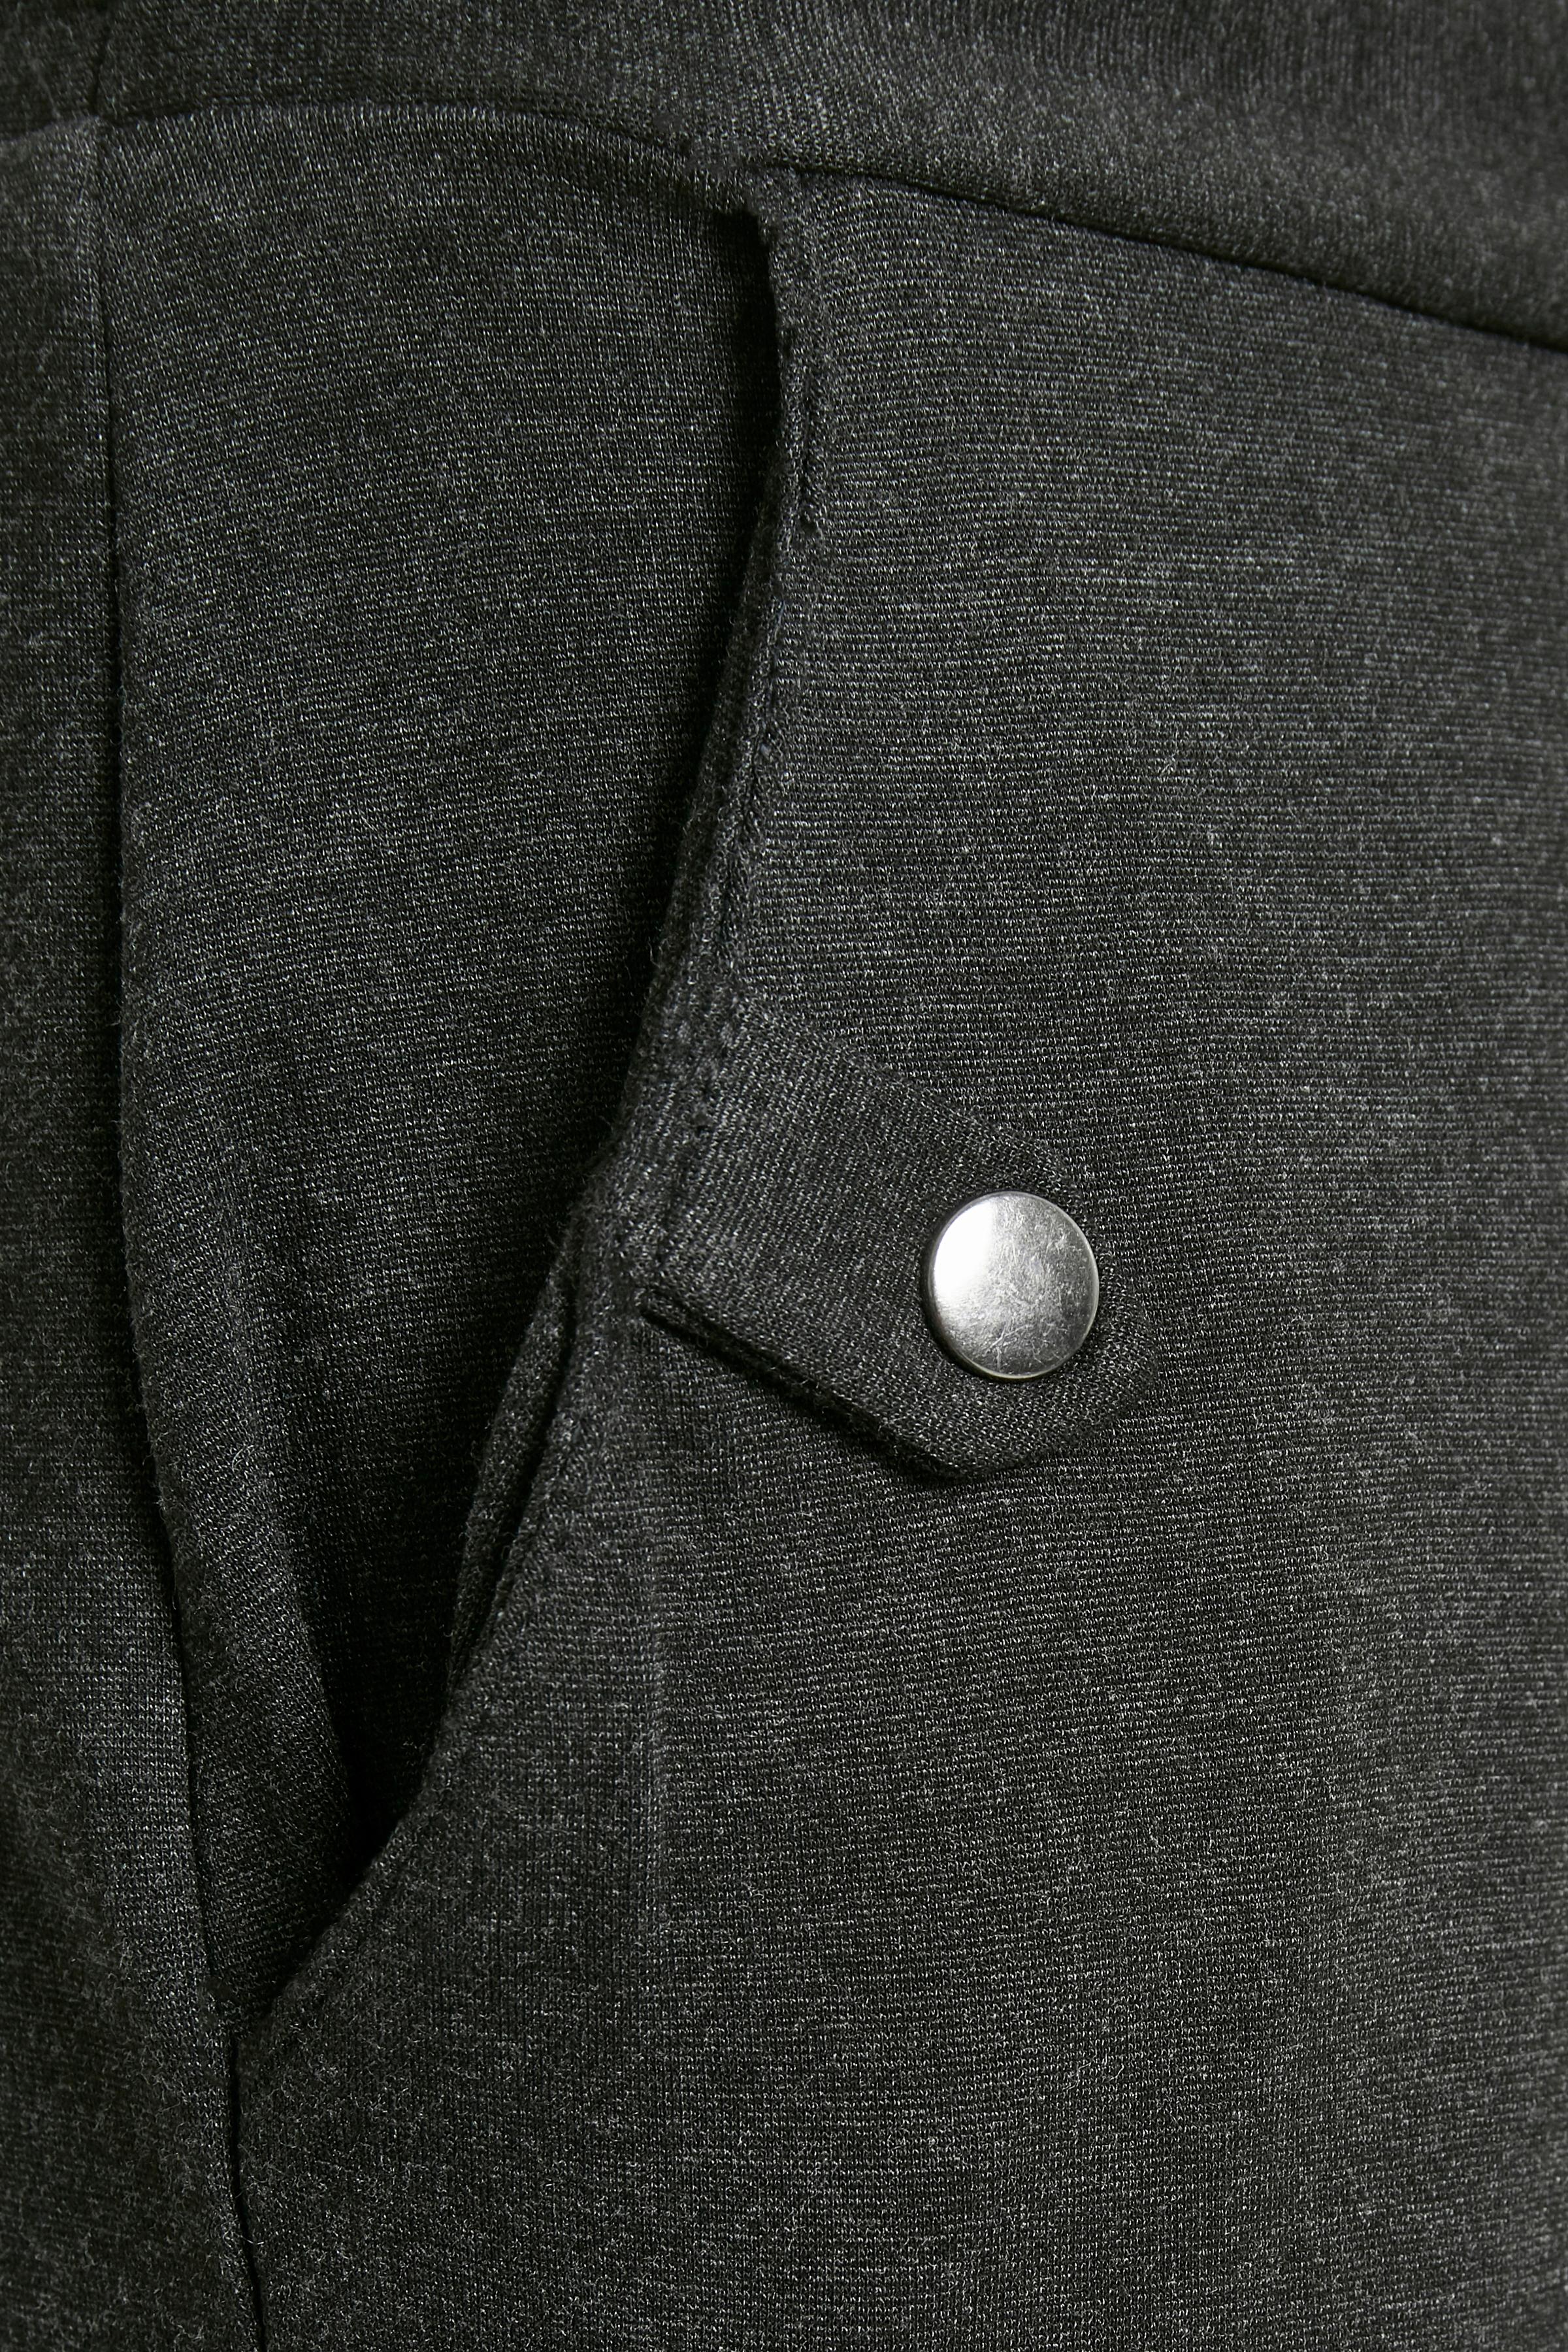 Mørk gråmeleret Casual bukser fra Fransa – Køb Mørk gråmeleret Casual bukser fra str. XS-XXL her